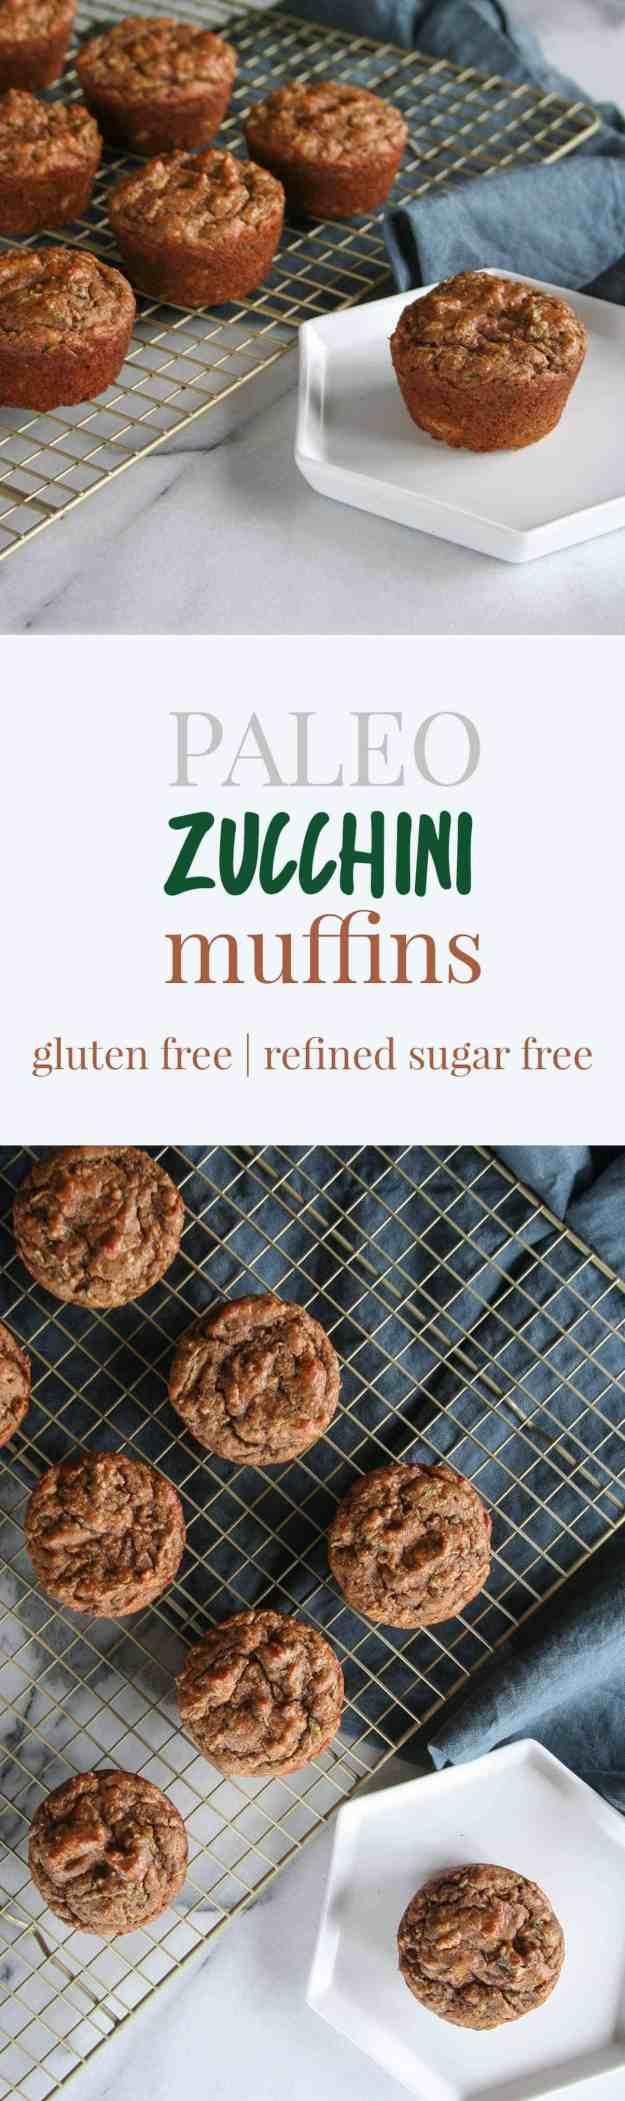 Paleo Zucchini Muffins | gluten free, grain free, refined sugar free, Whole30, easy, healthy, banana, almond butter, baking | hungrybynature.com